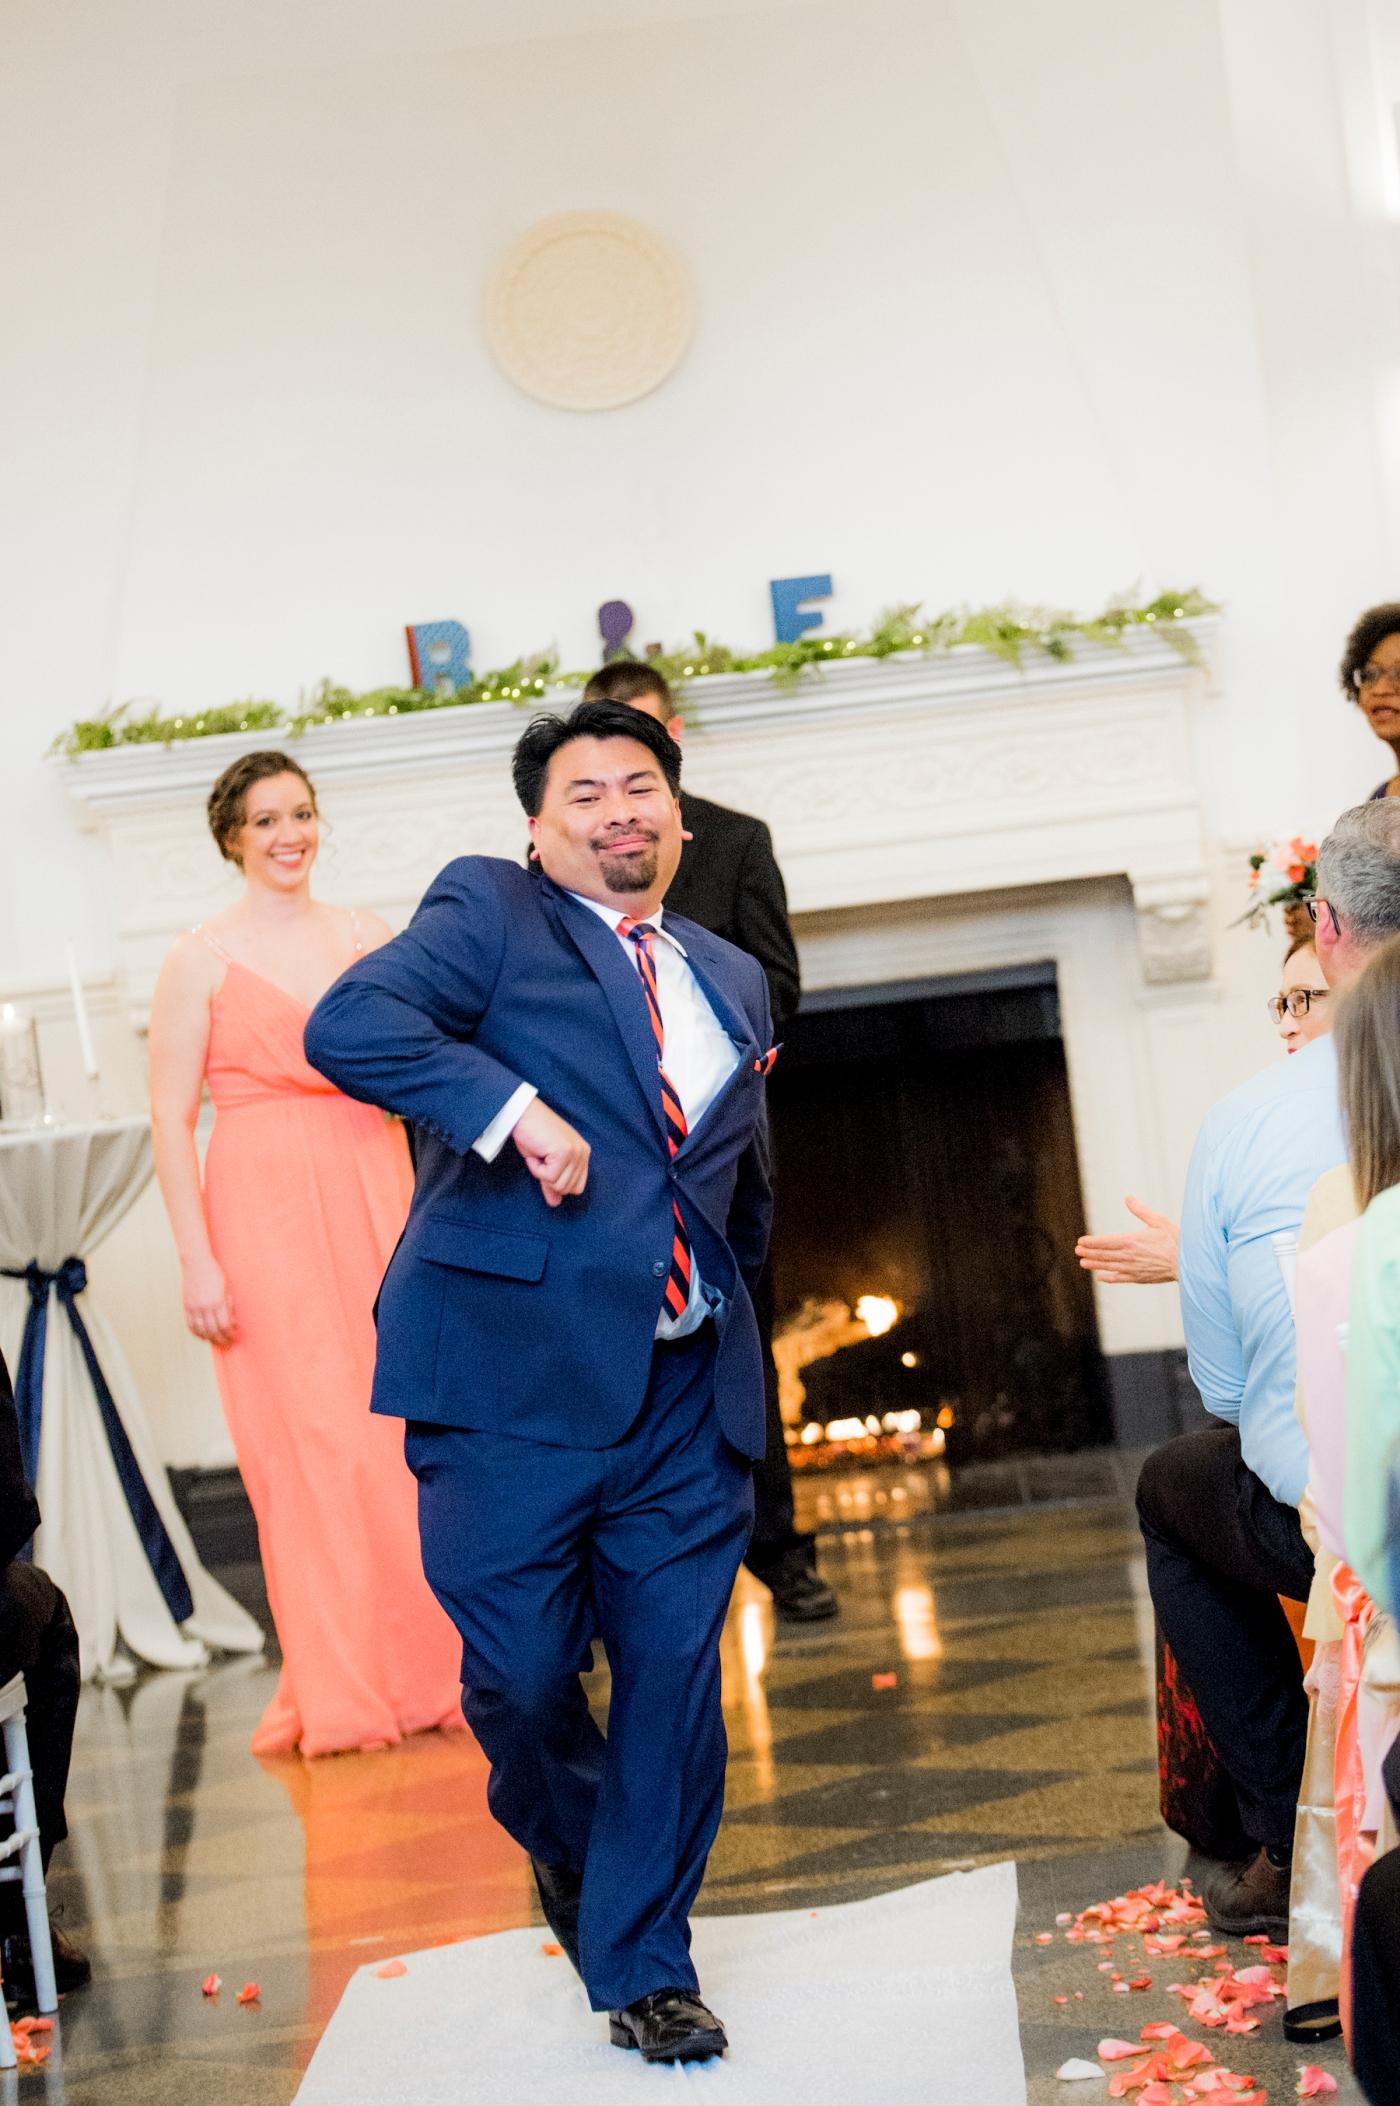 DSC_2749Everett_Wedding_Ballroom_Jane_Speleers_photography_Rachel_and_Edmund_Ceremony_2017